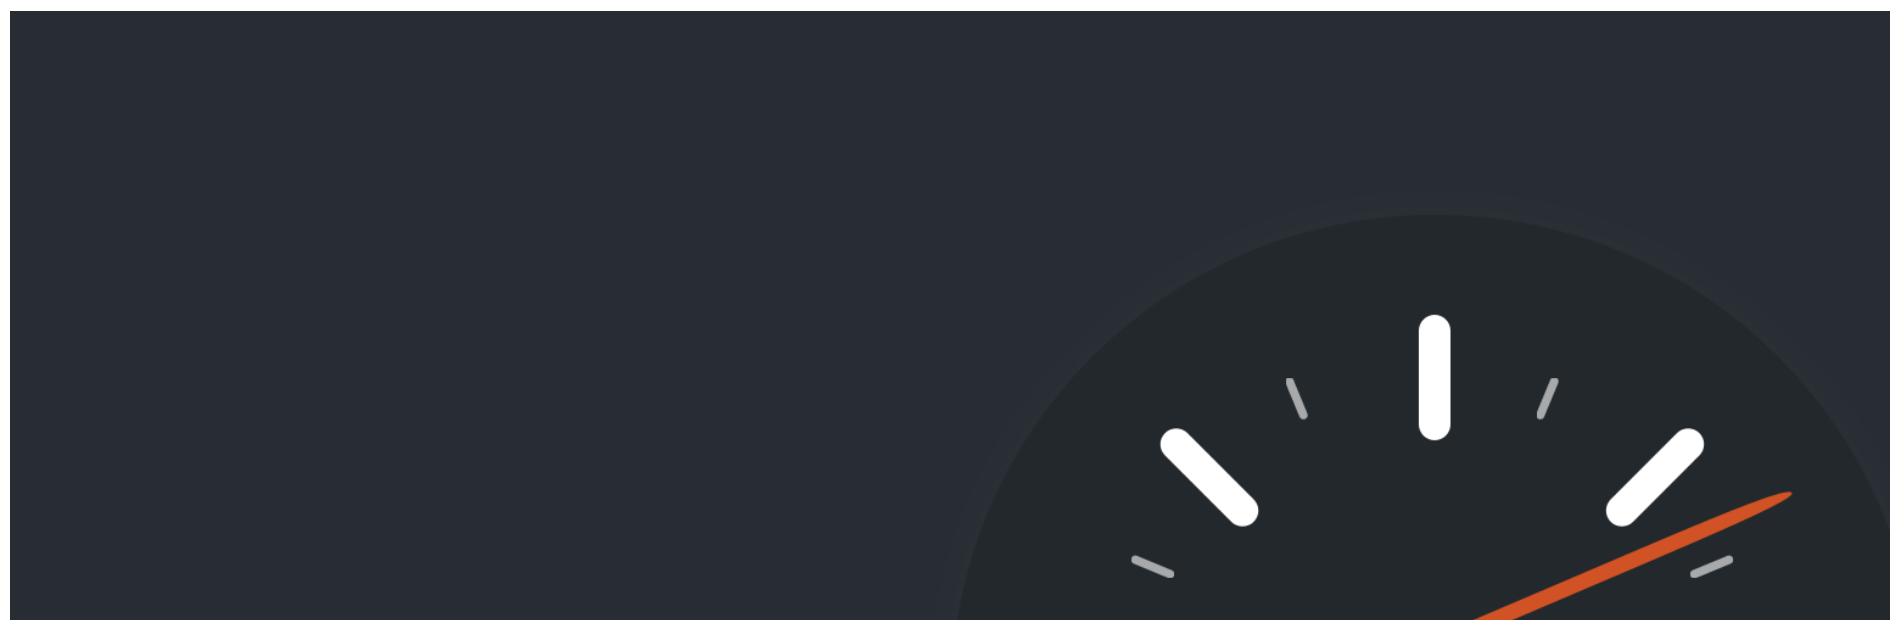 website-speed-wordpress-plugin-wp-super-cache